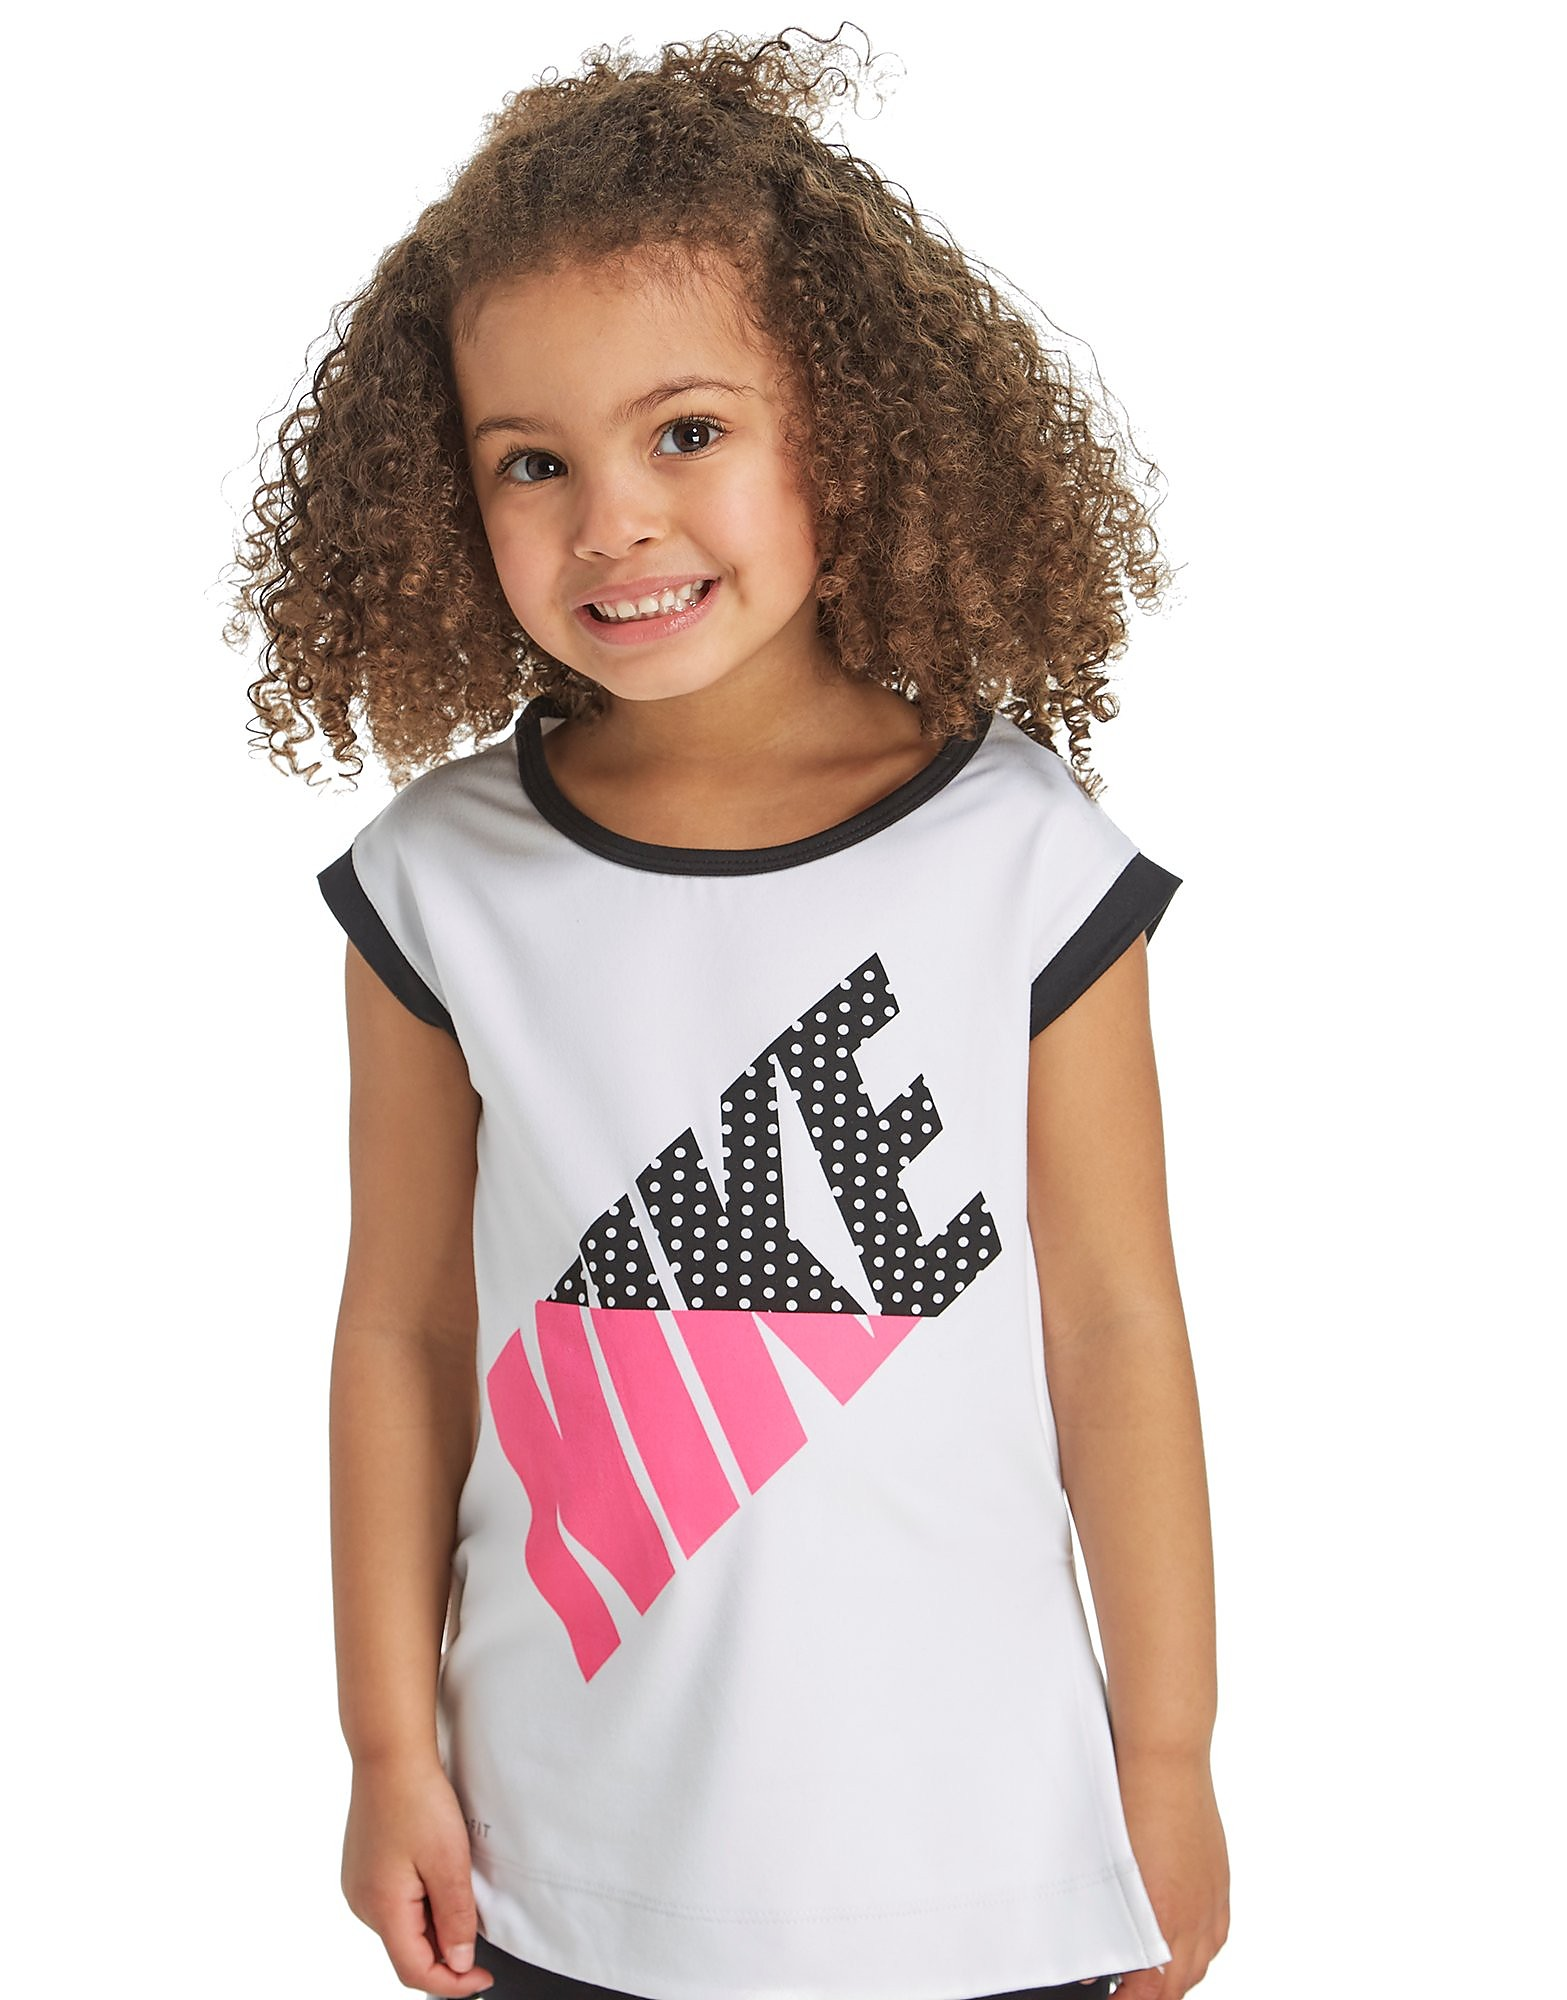 Nike Girls' Tunic T-Shirt Children